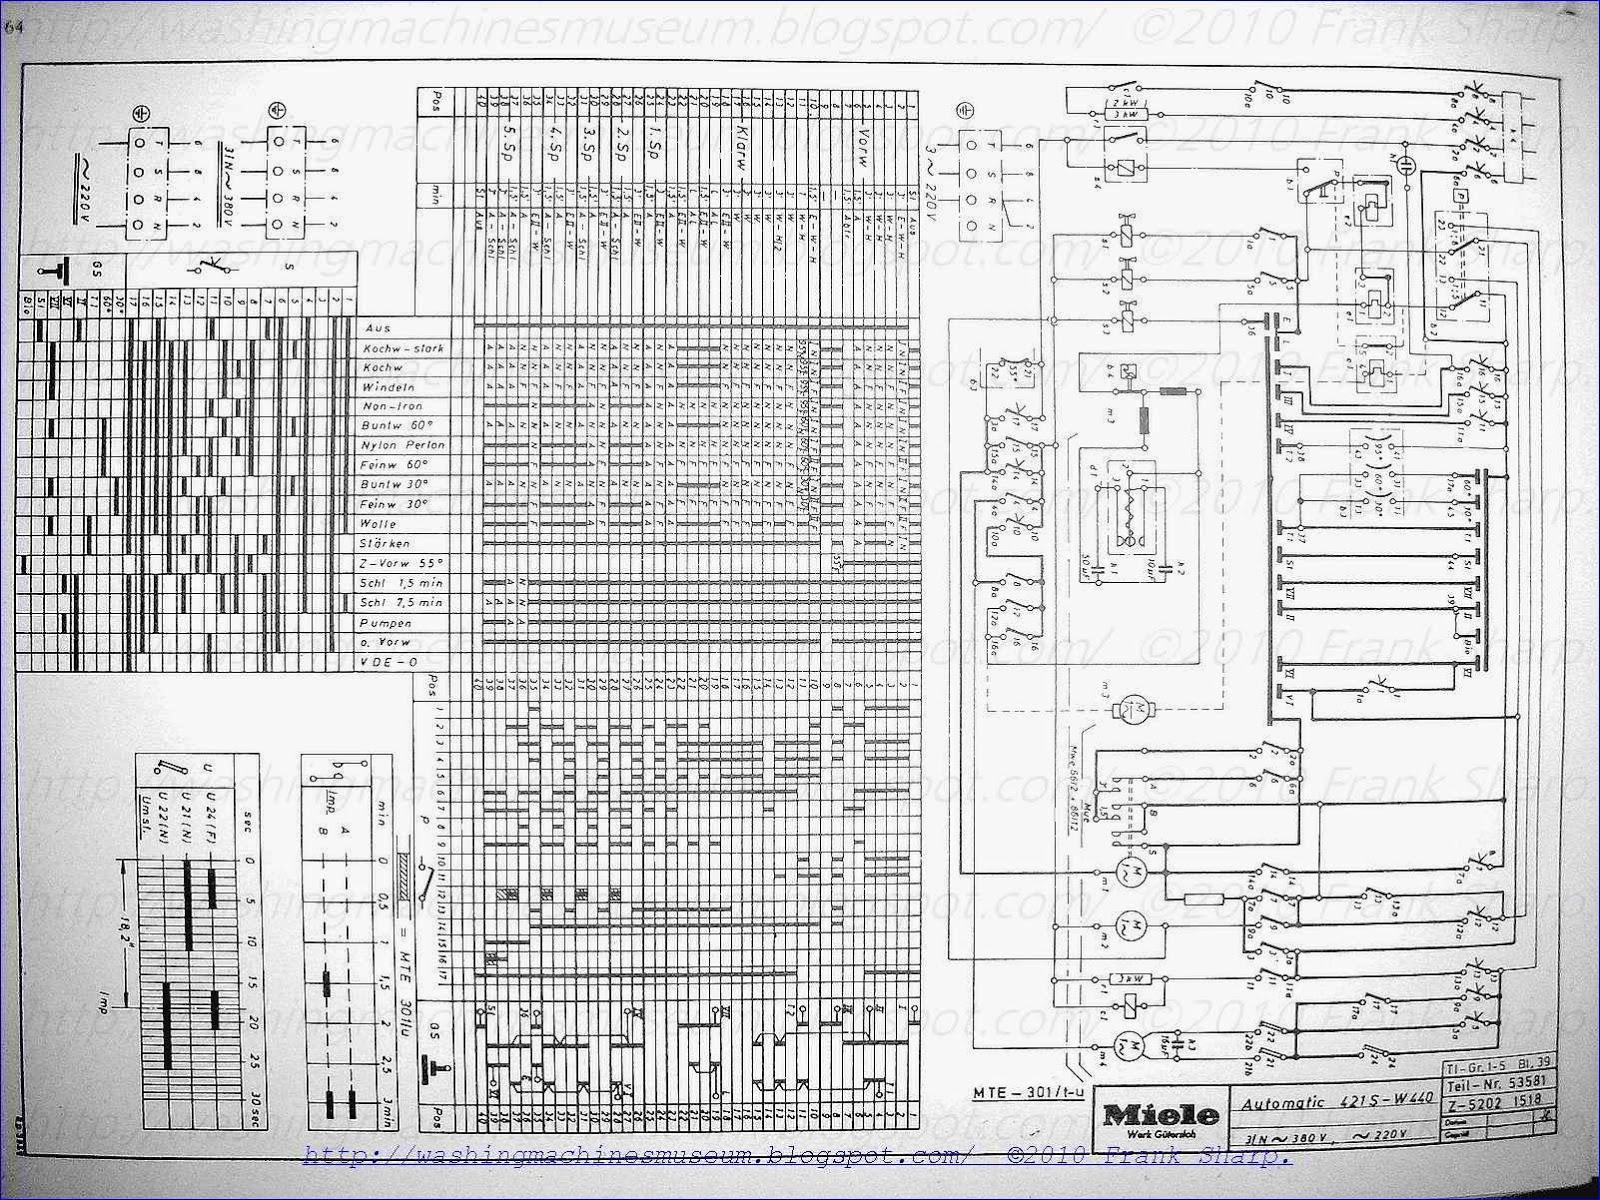 miele wiring diagram wiring librarymiele automatic 421s w440 timer holzer mte 301 t u schematic diagram [ 1600 x 1200 Pixel ]